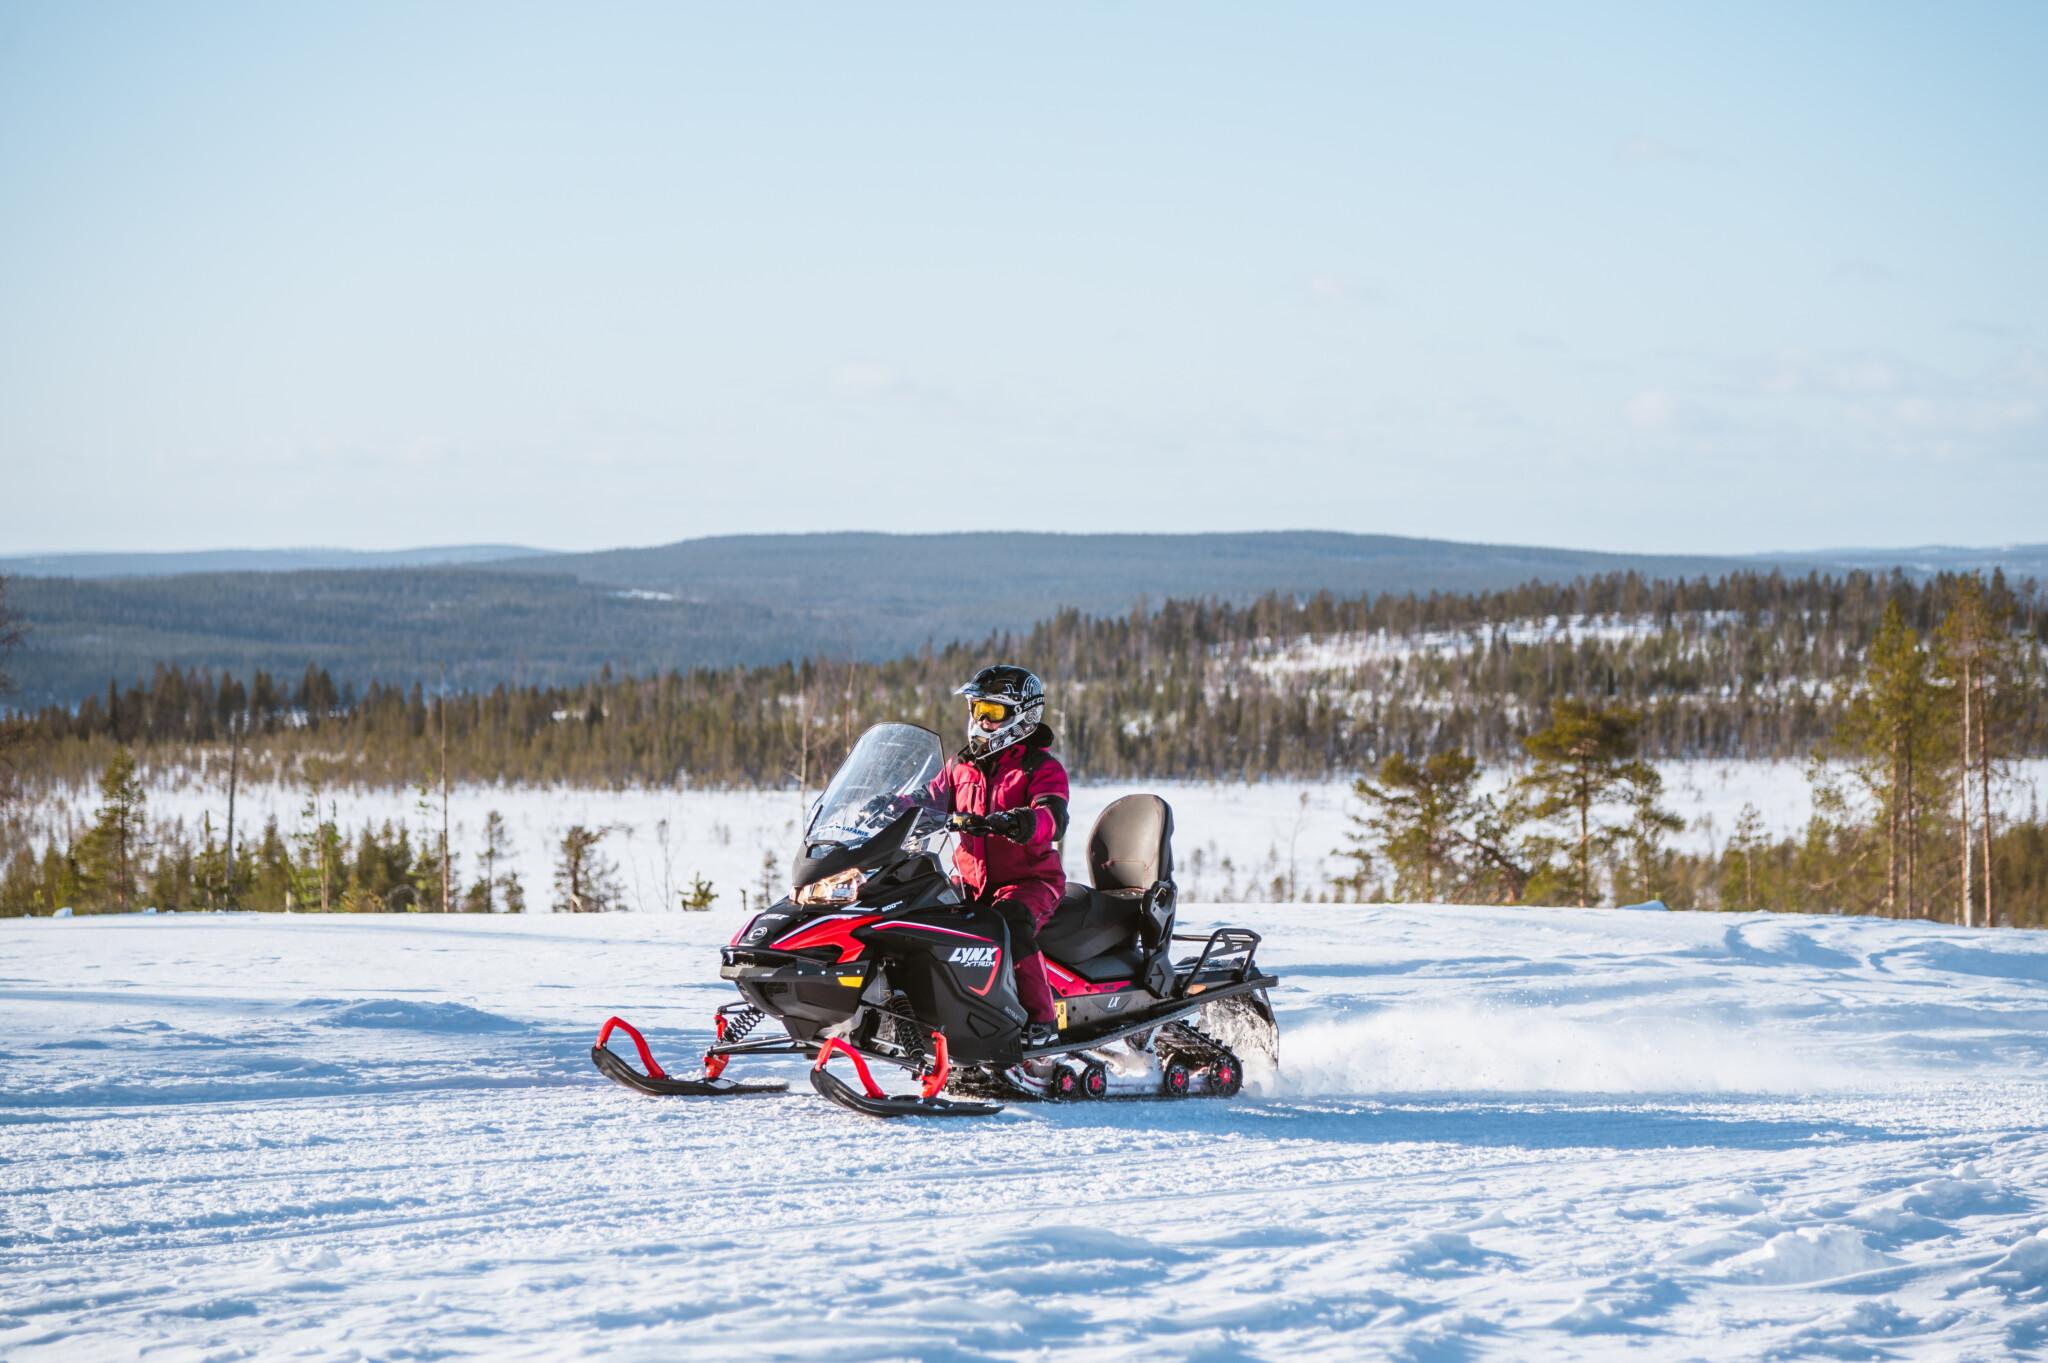 Moottorikelkkailu Rovaniemella Lapissa Snowmobiling in Rovaniemi Lapland Finland